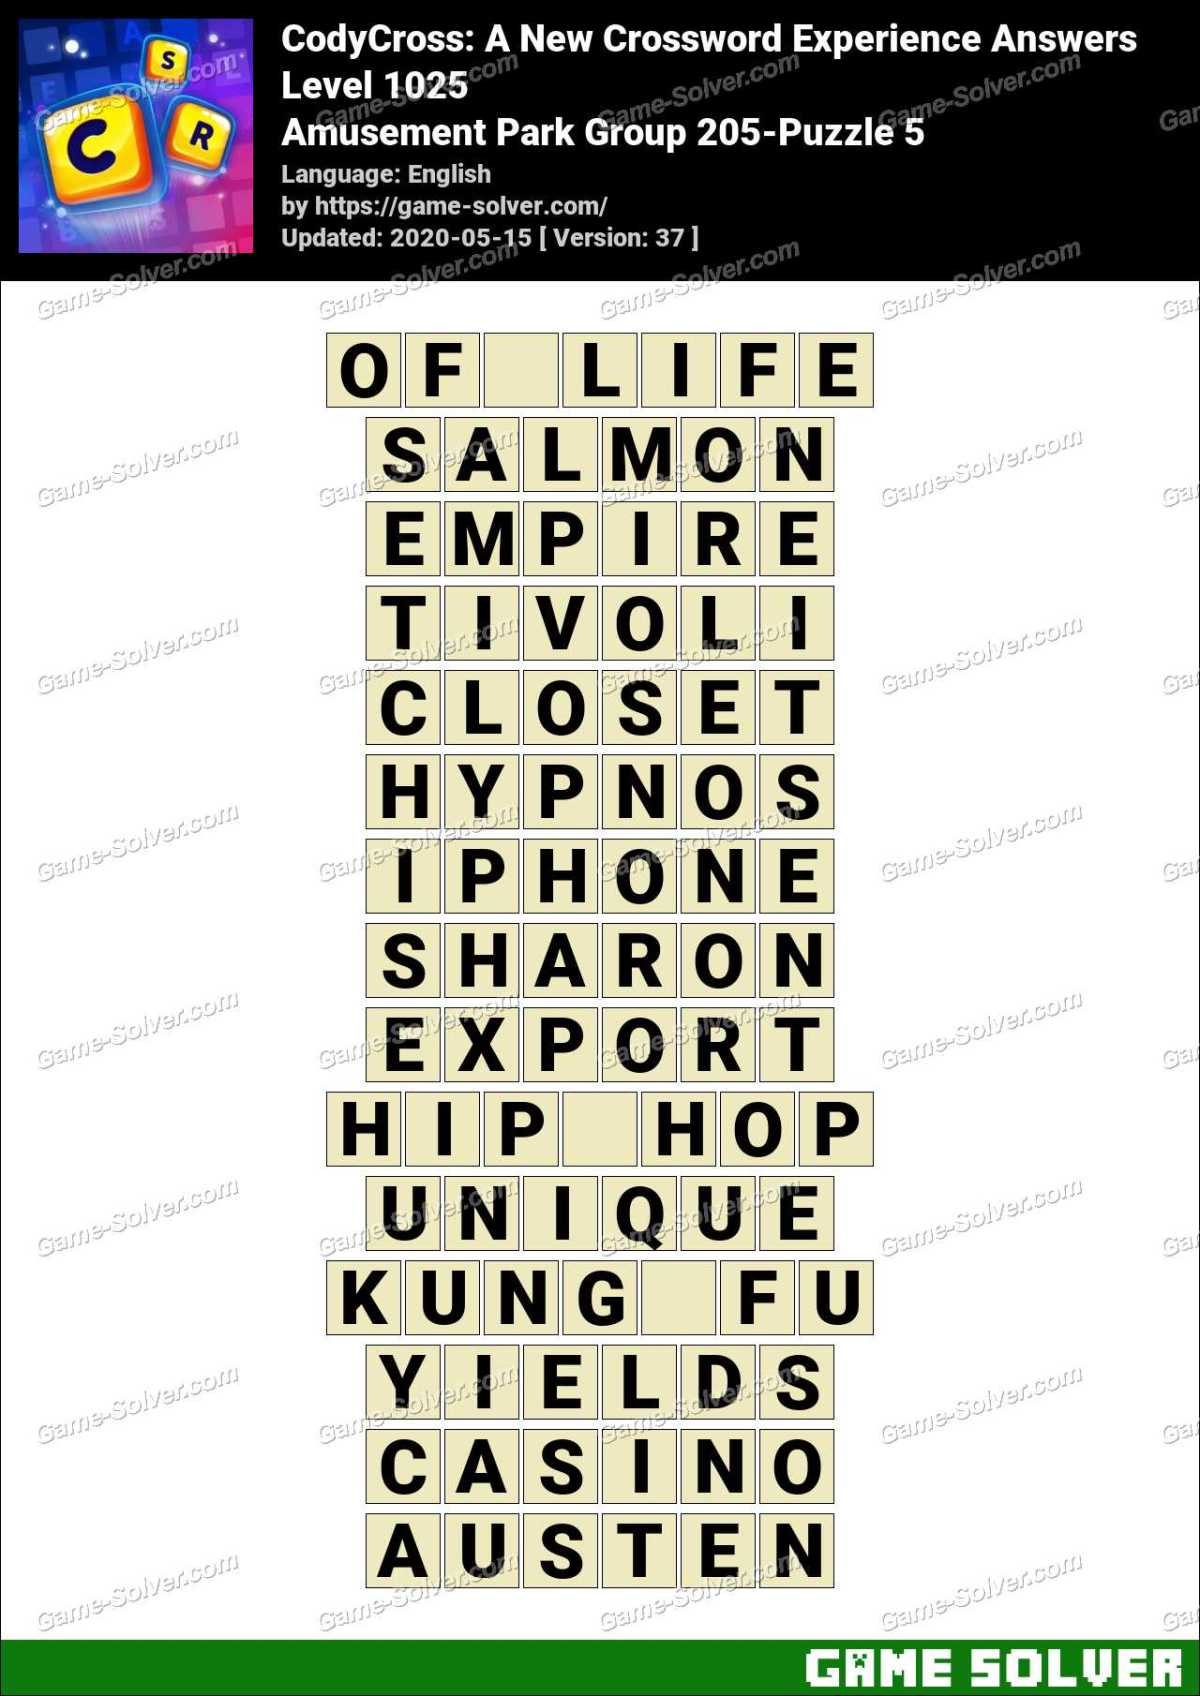 CodyCross Amusement Park Group 205-Puzzle 5 Answers